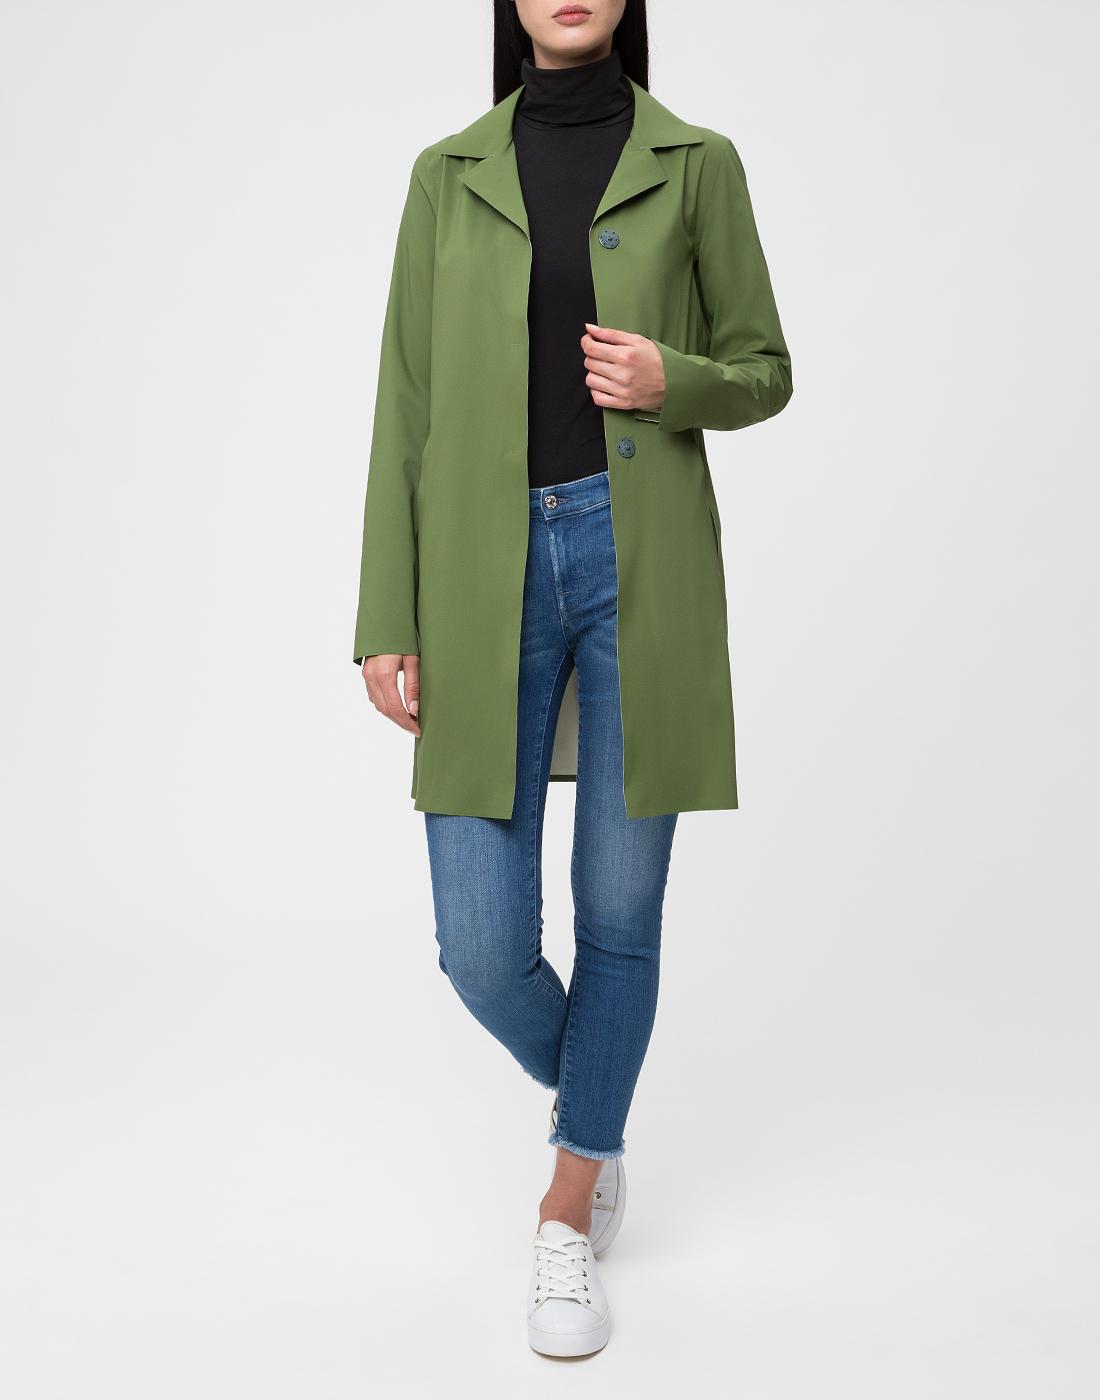 Женский зеленый плащ Herno SIM0035D-19289-7012-5